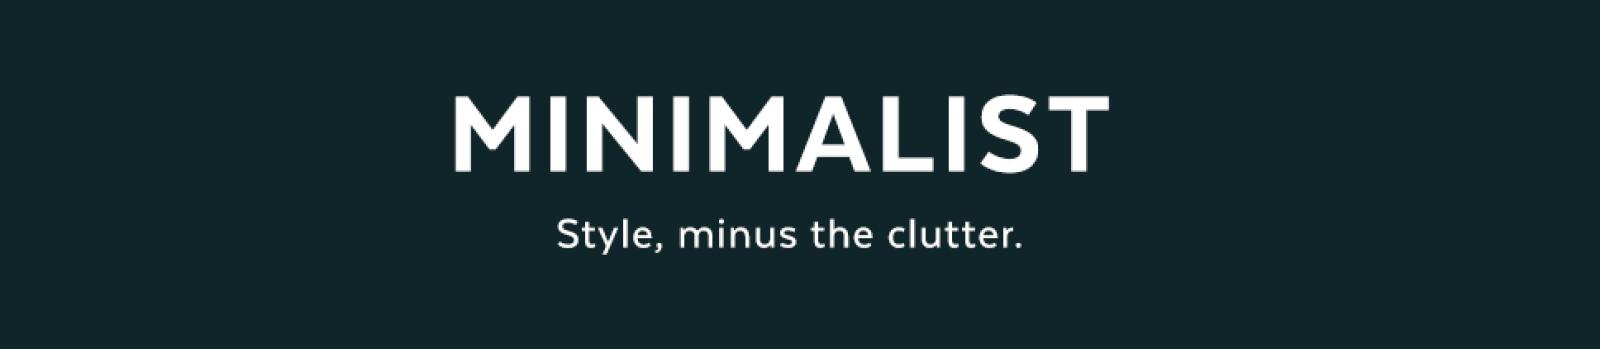 Minimalist Style Shop